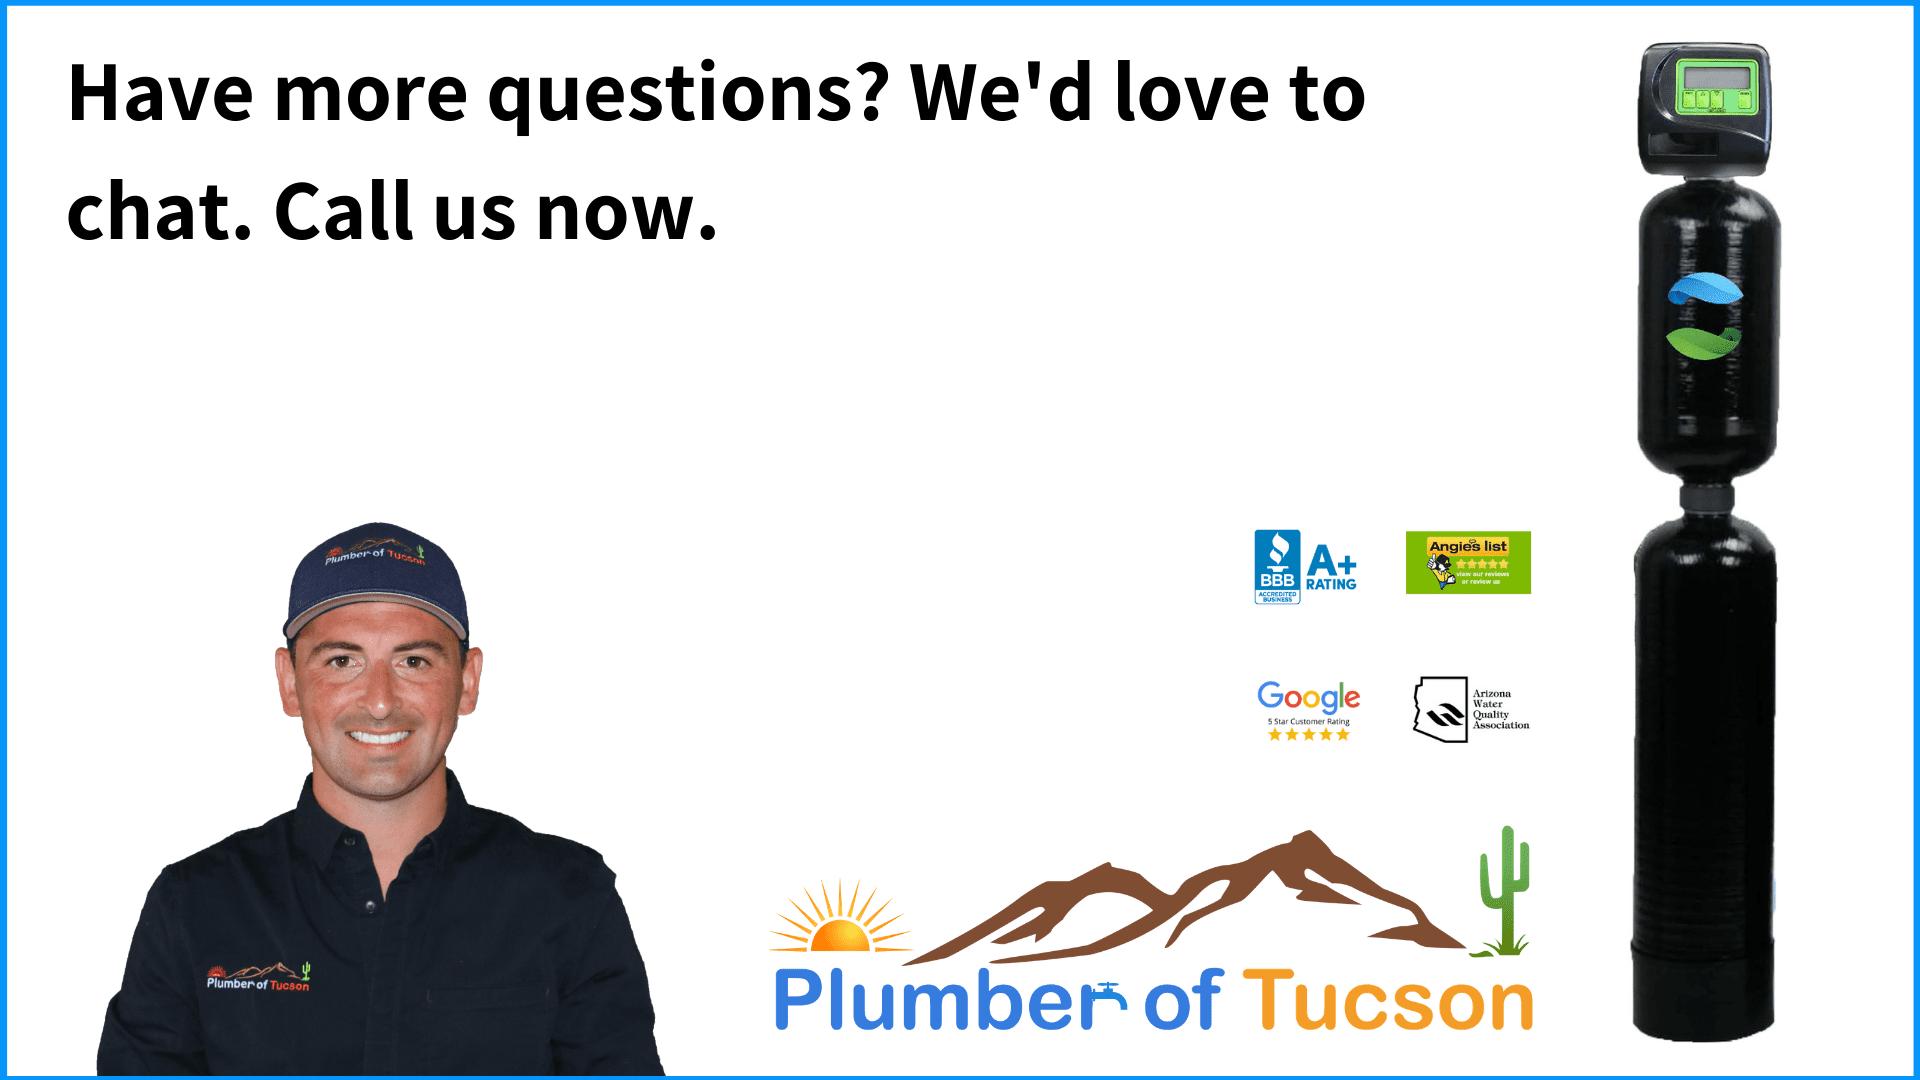 Plumber of Tucson